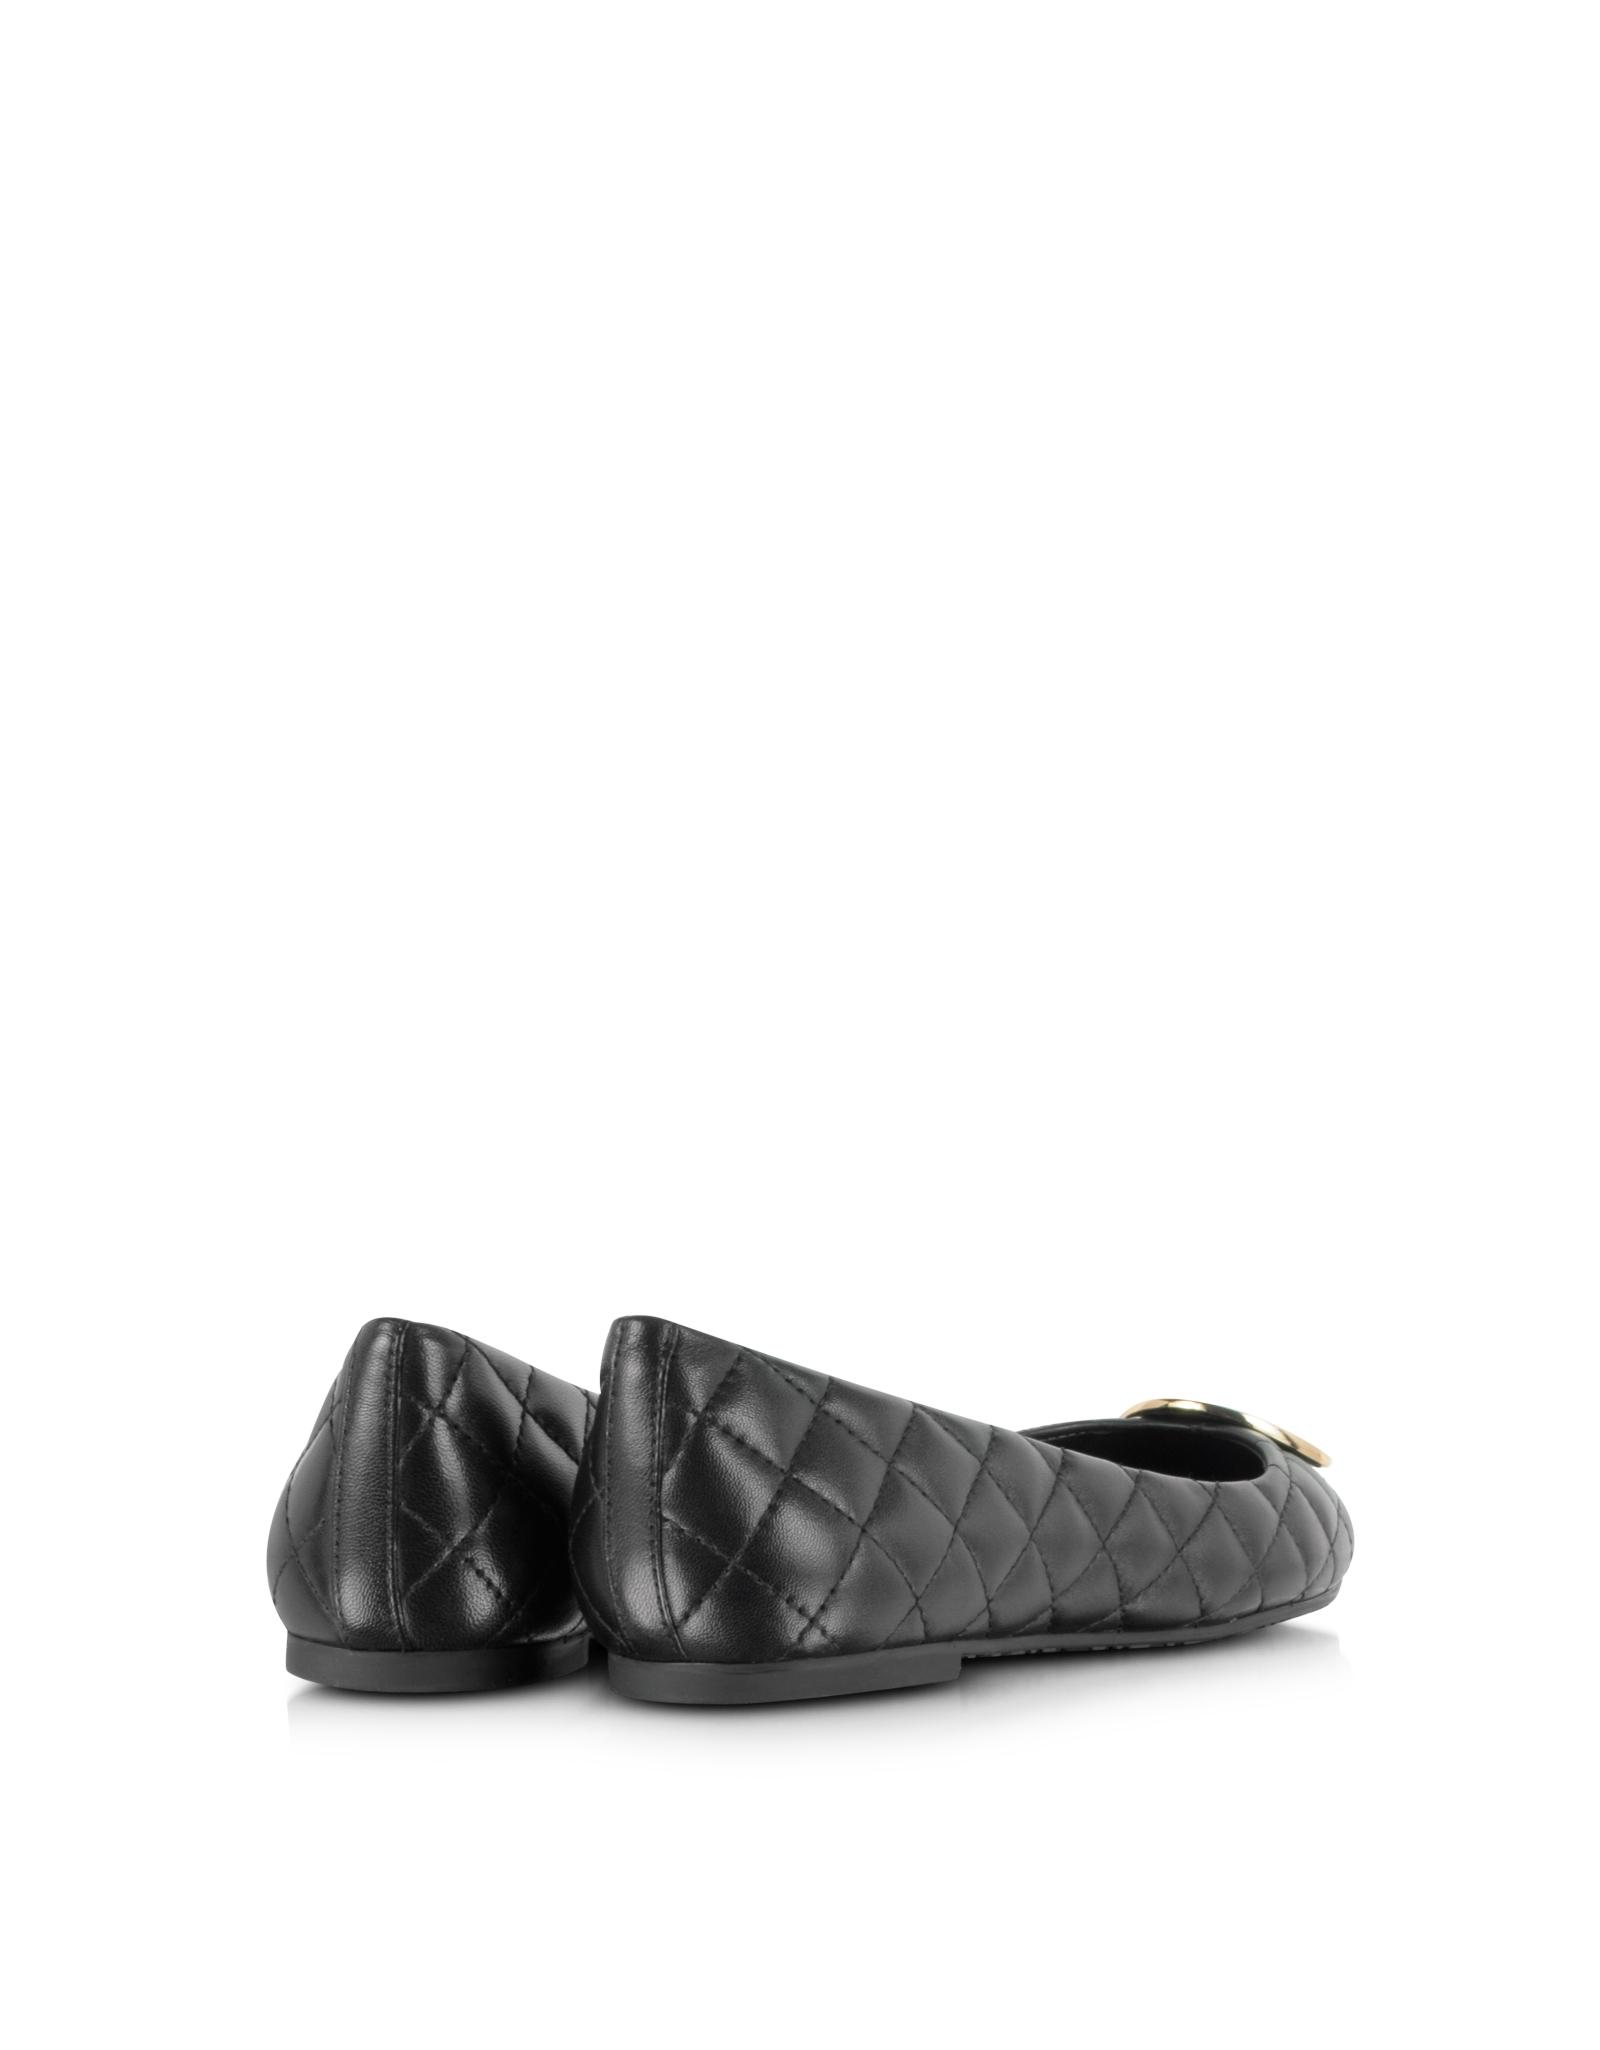 7bc099a2c06f Lyst - Tory Burch Quinn Black Quilted Flat W logo in Black